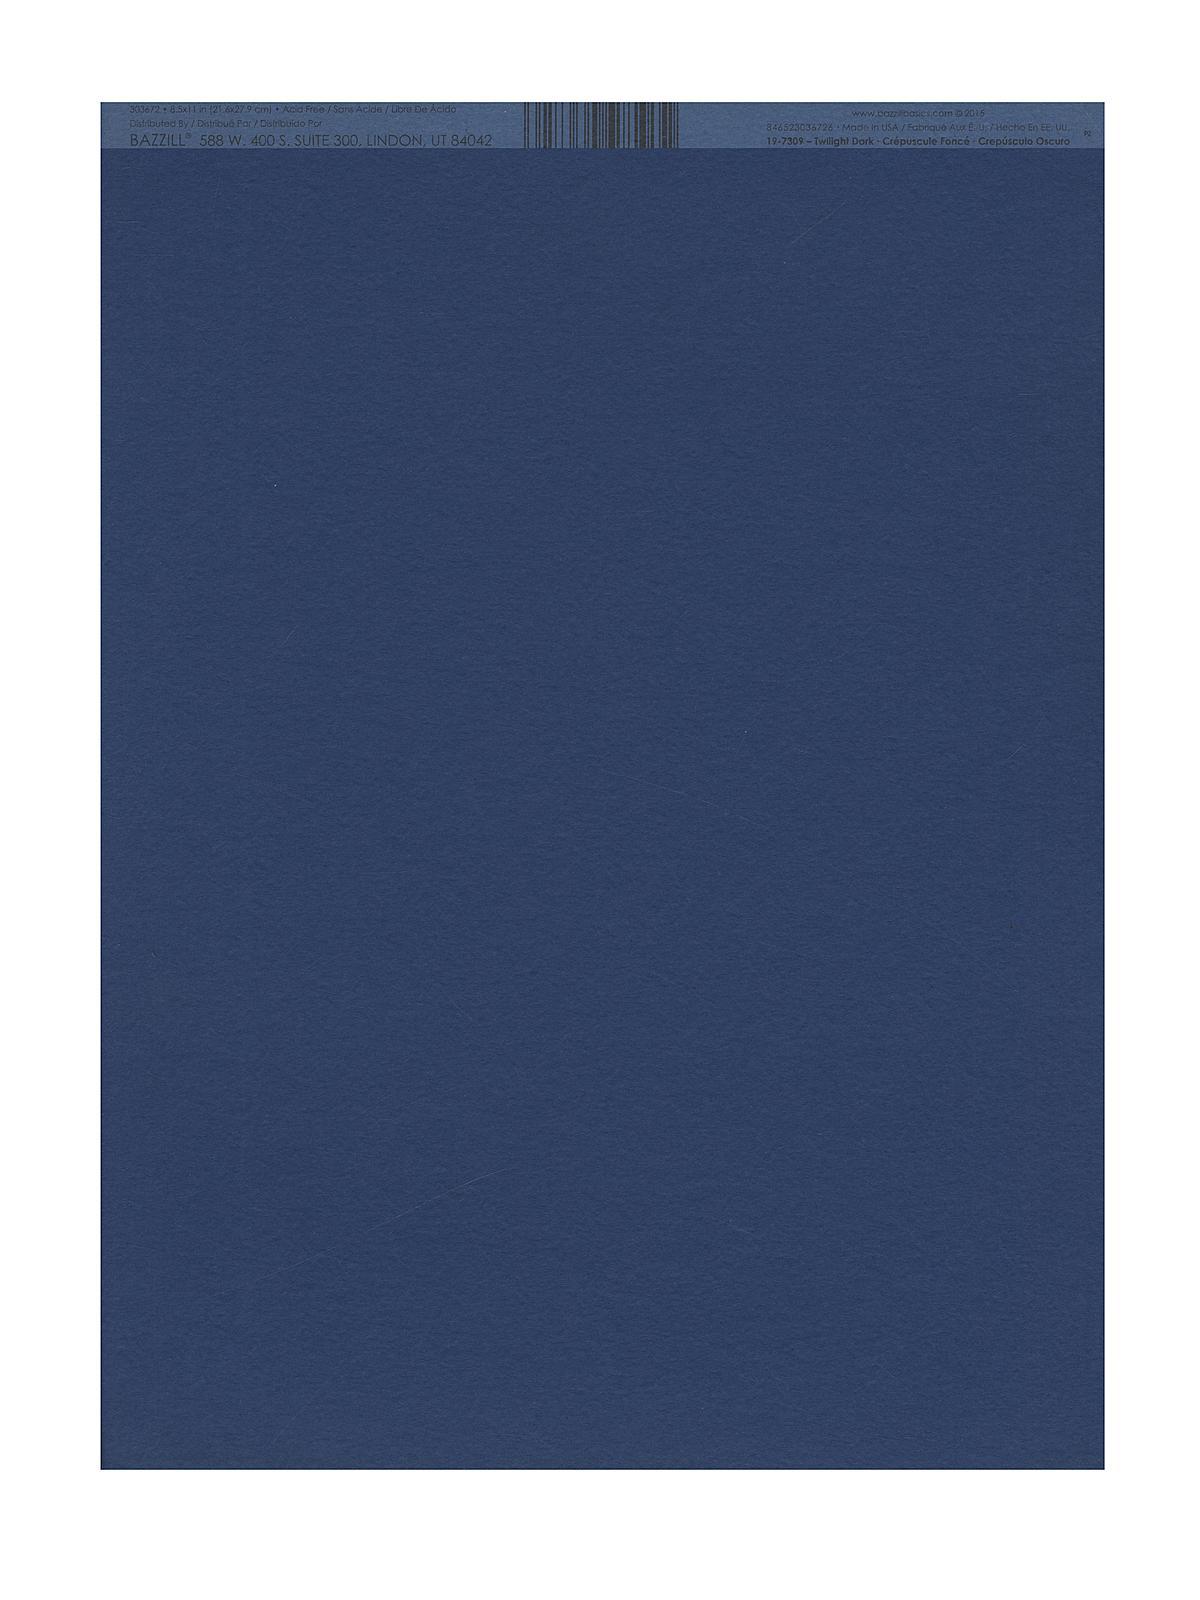 Classic Cardstock 8 1 2 In. X 11 In. Twilight Dark Sheet